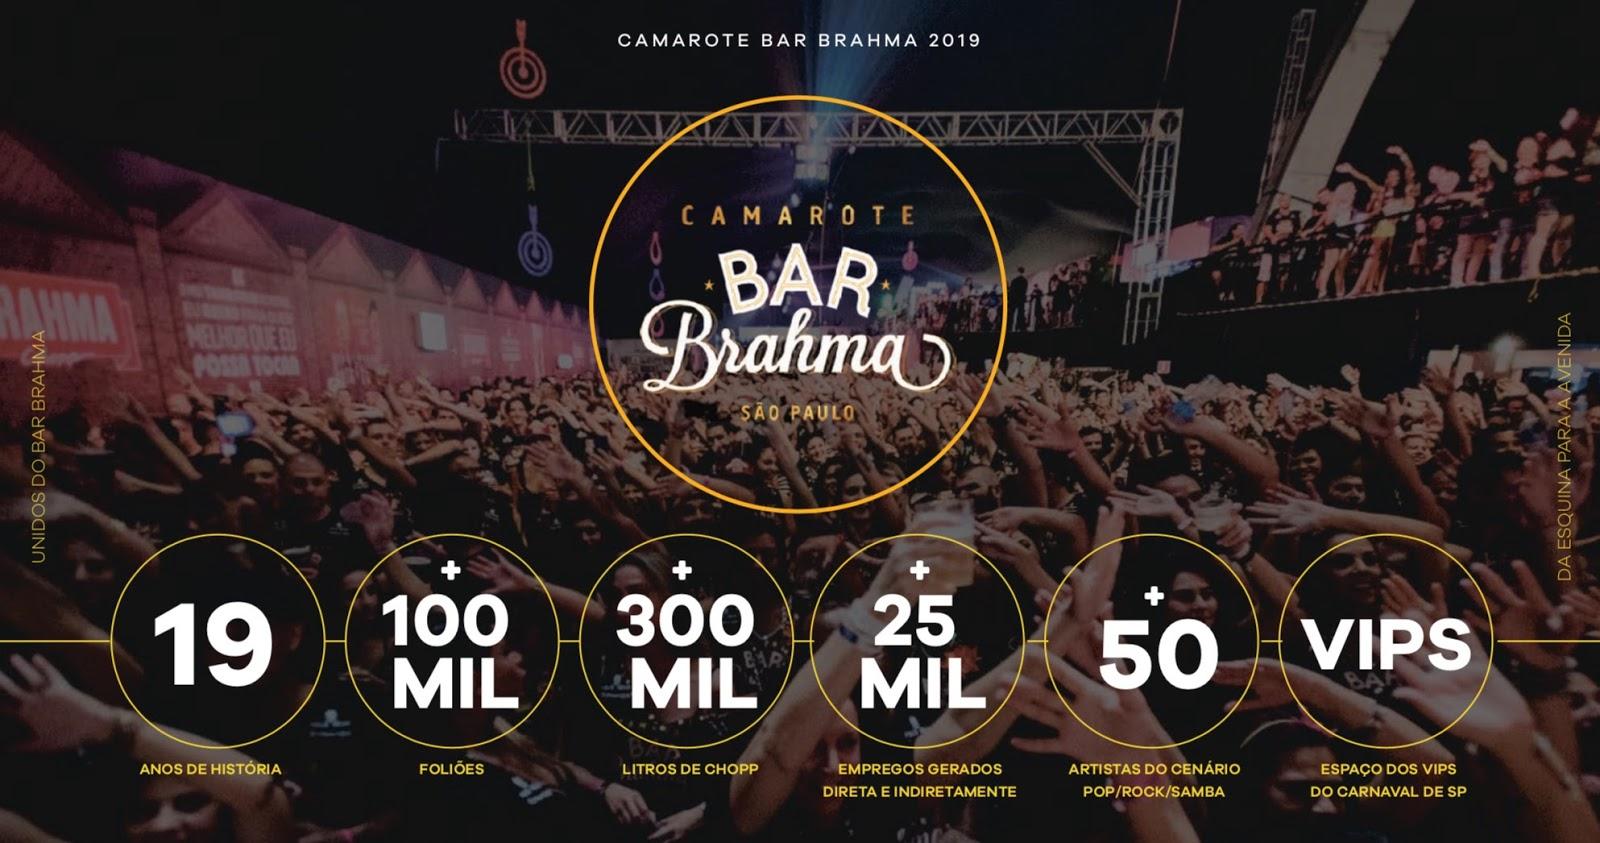 Camarote Bar Brahma dá primeiro grito de Carnaval nos 465 anos de ... ddaf997338c76